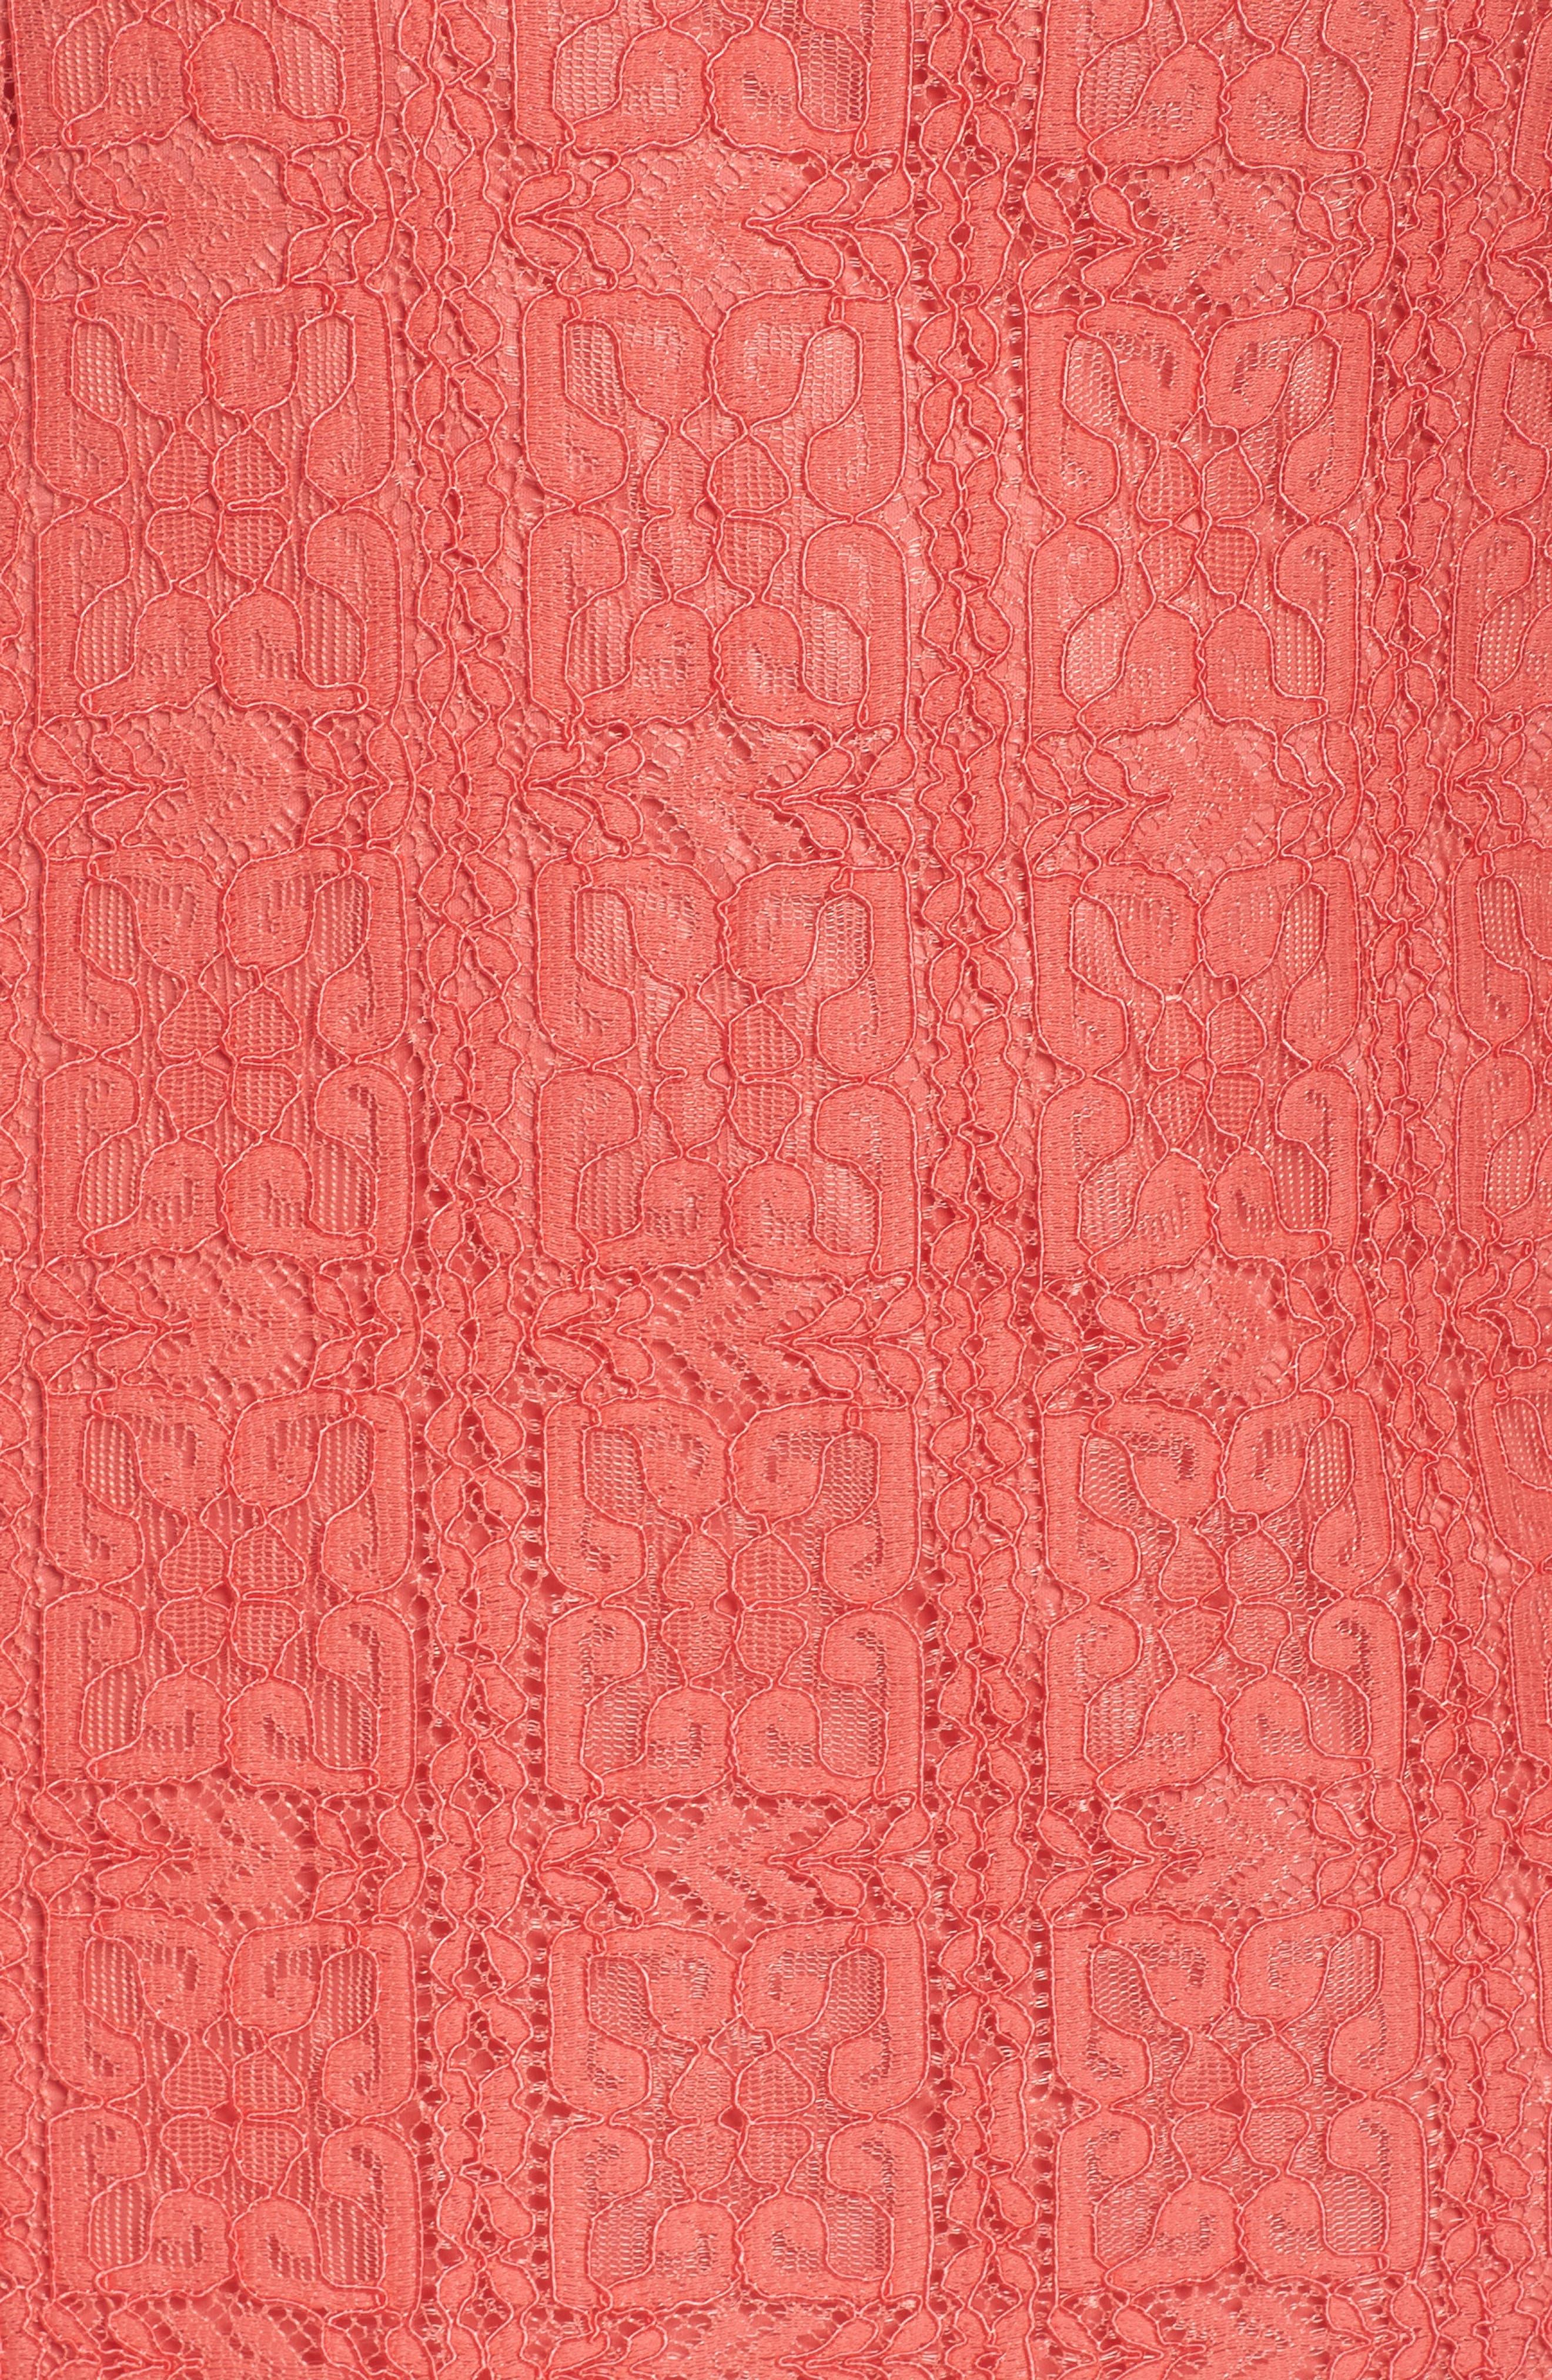 Marni Lace Shift Dress,                             Alternate thumbnail 5, color,                             Cruise Coral